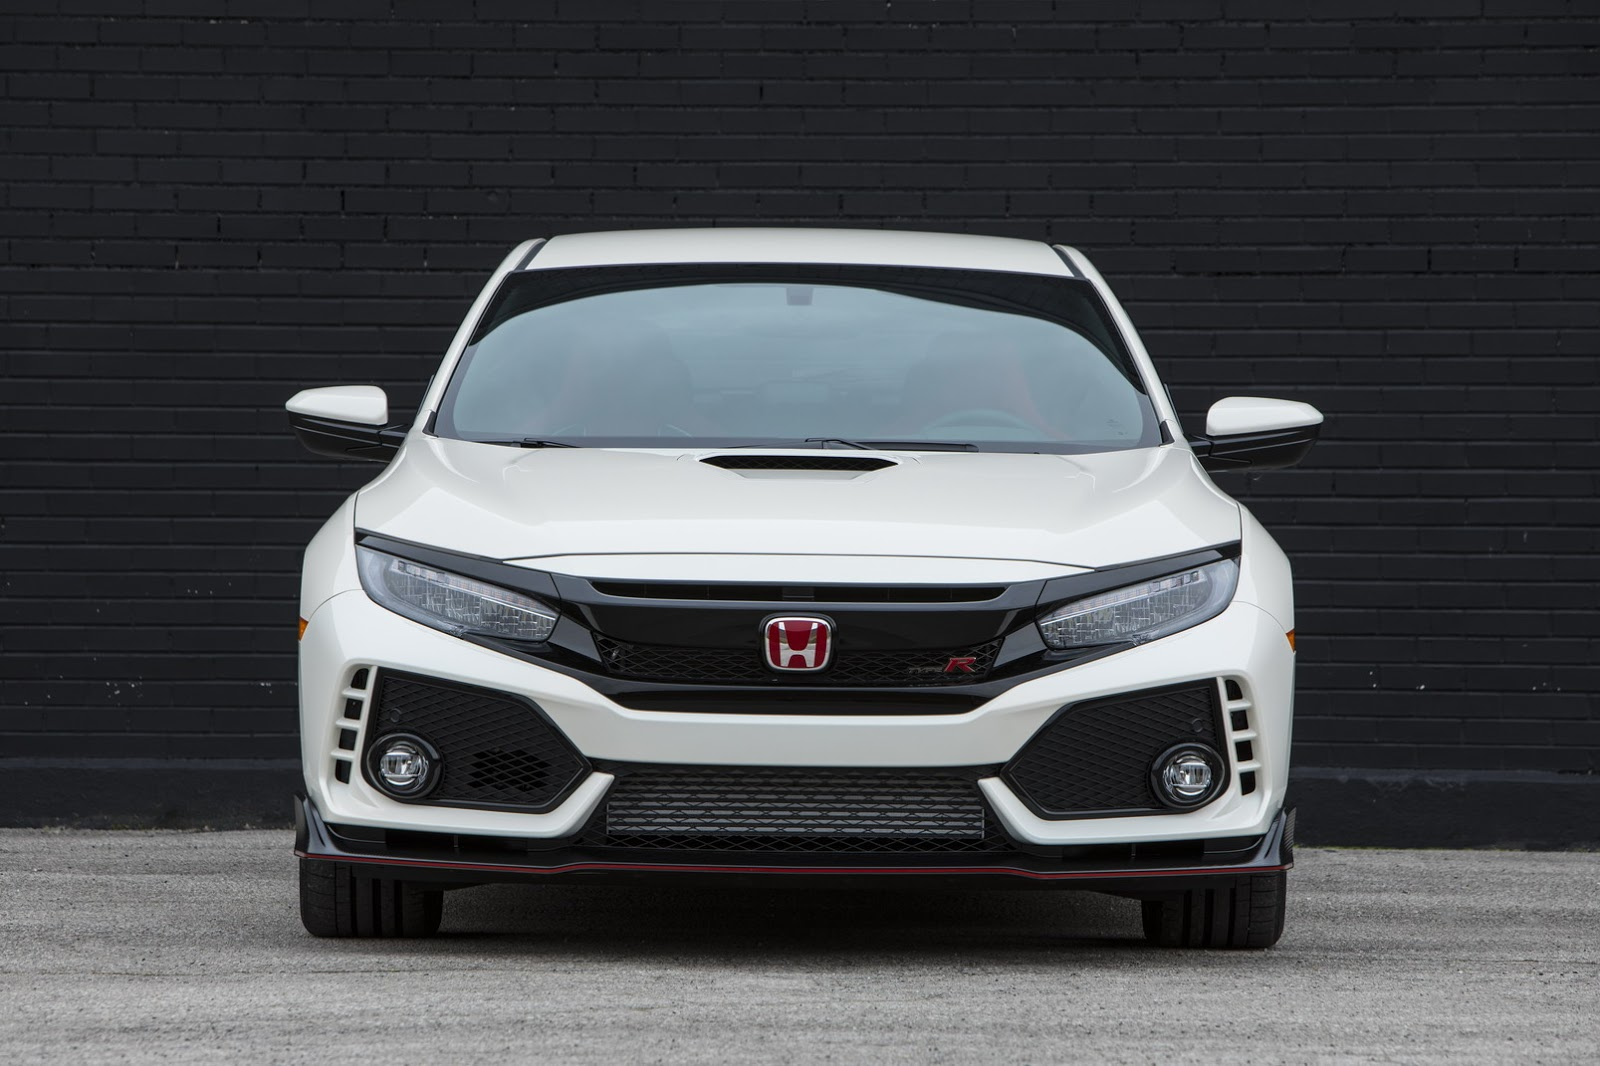 2017_Honda_Civic_Type_R_26